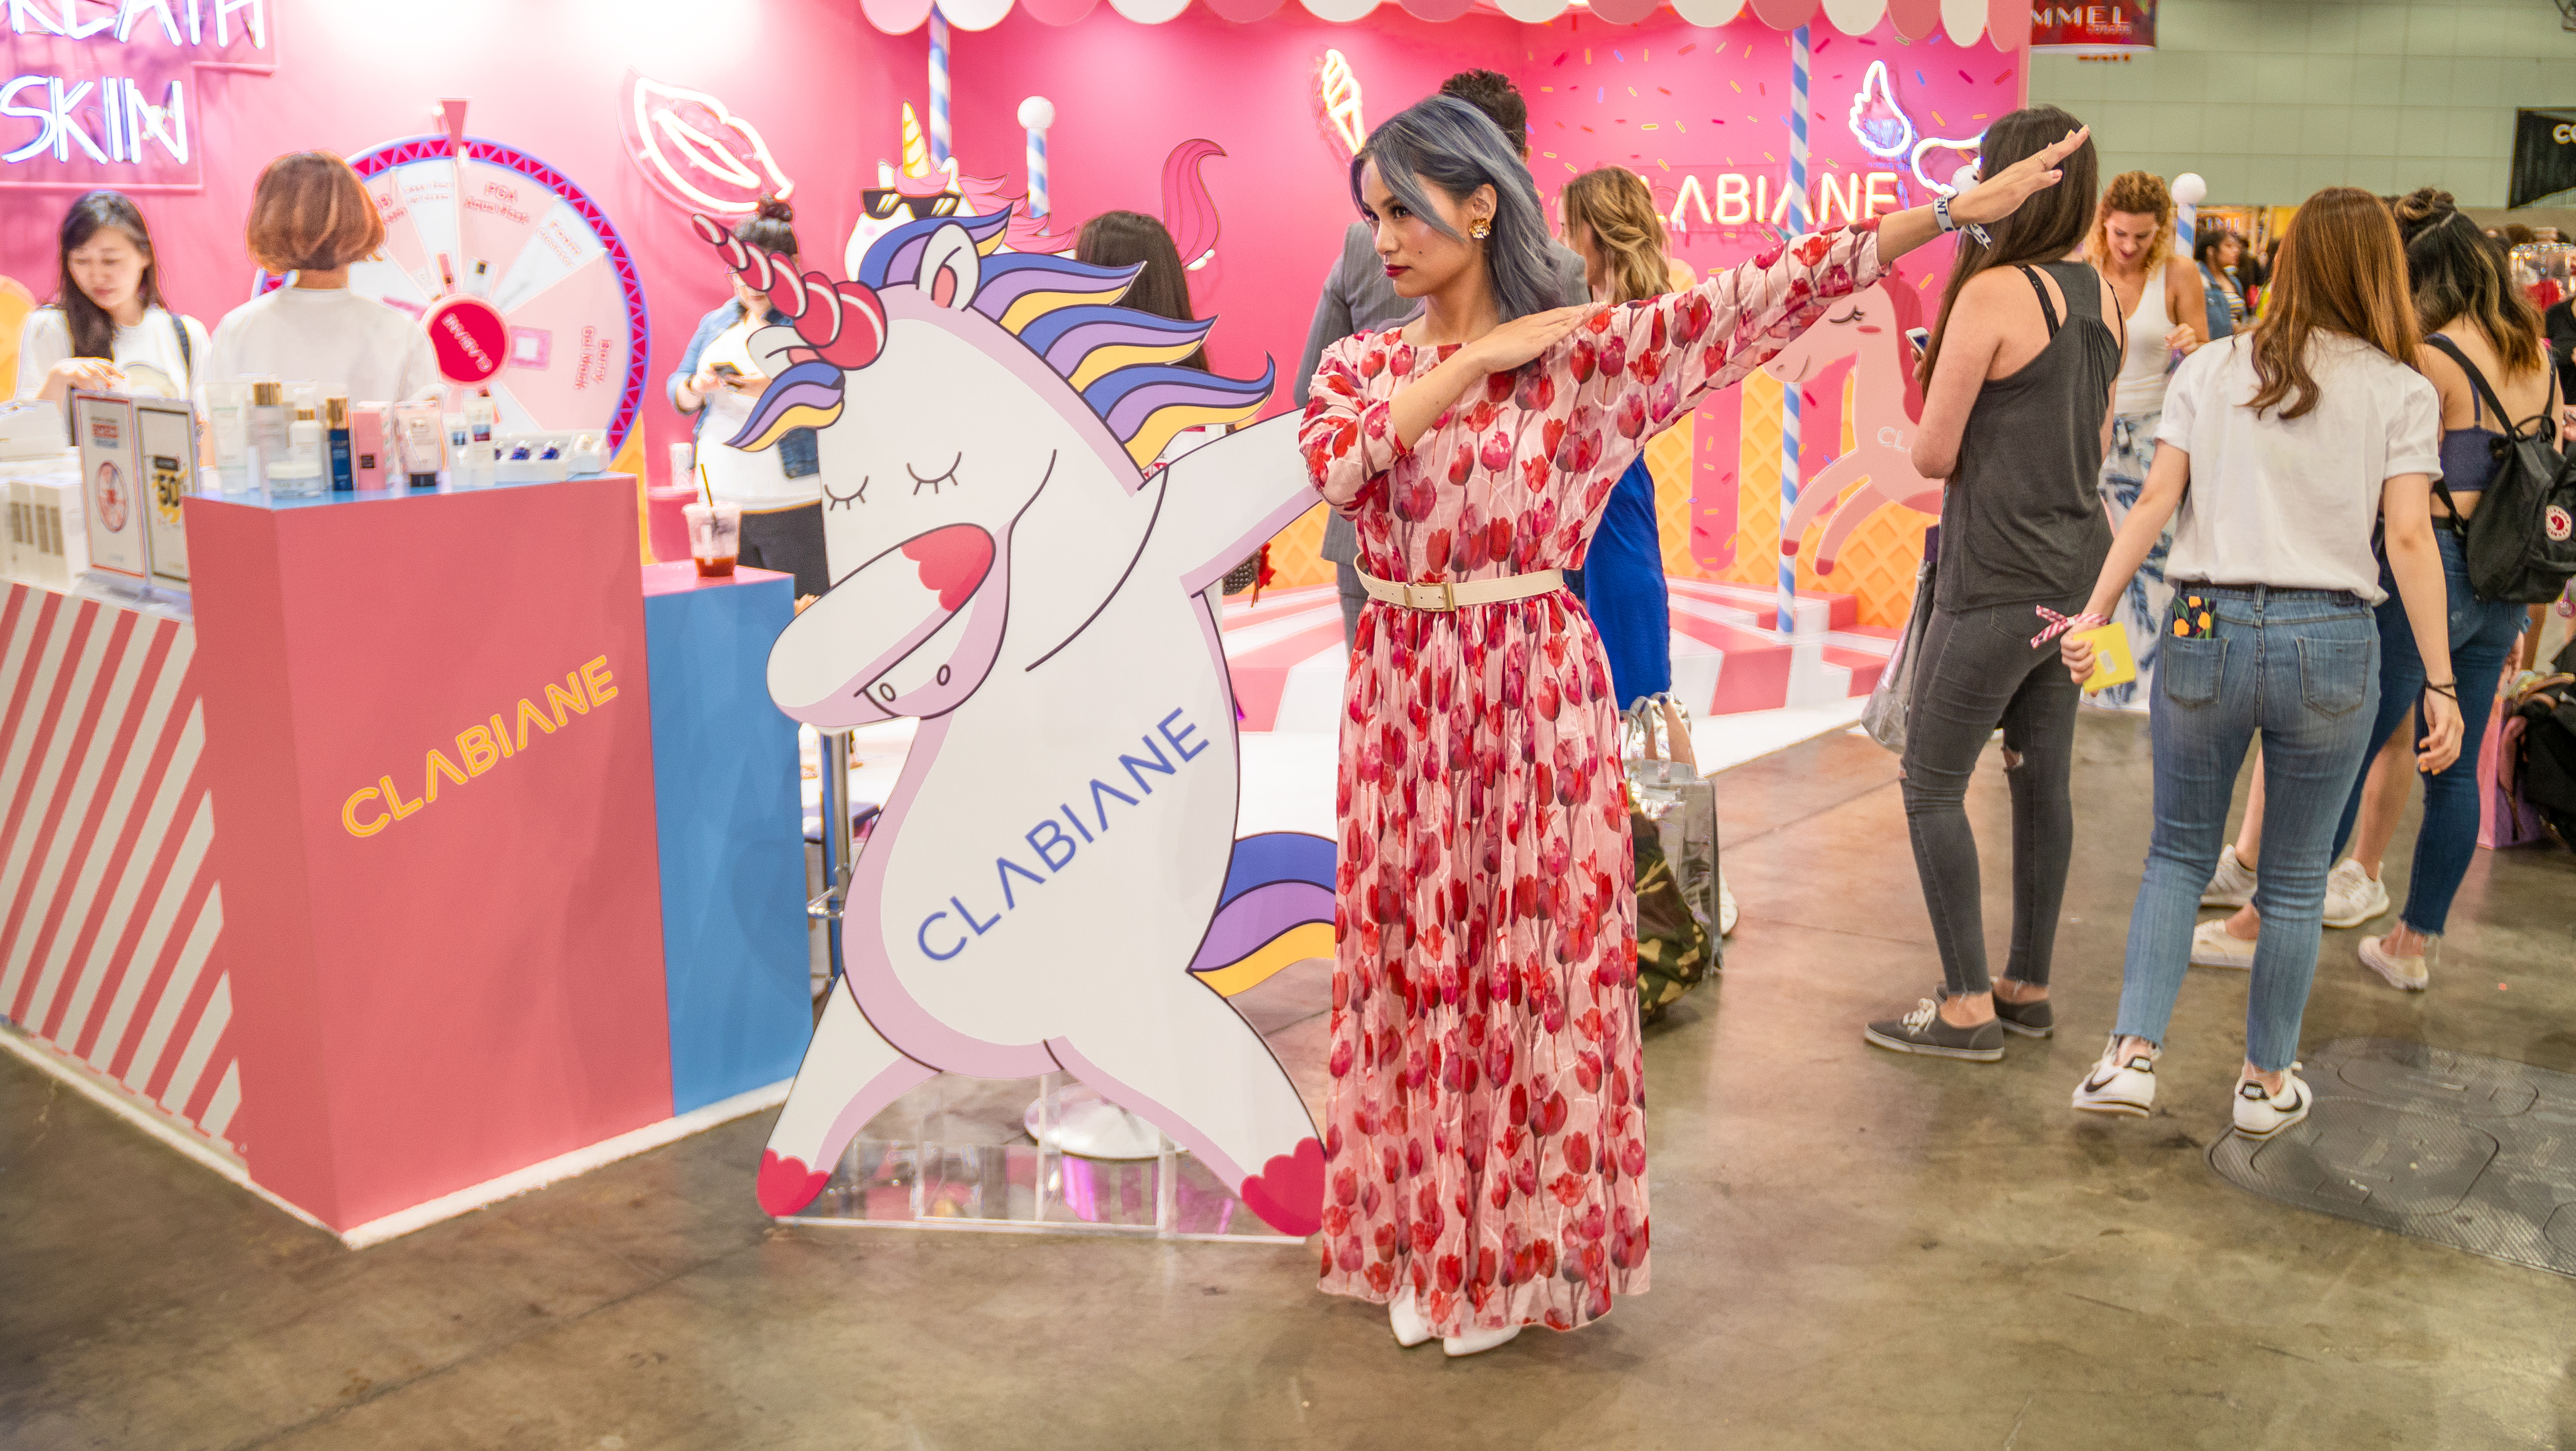 YukiBomb with Clabiane Kbeauty Brand during Beautycon LA 2018